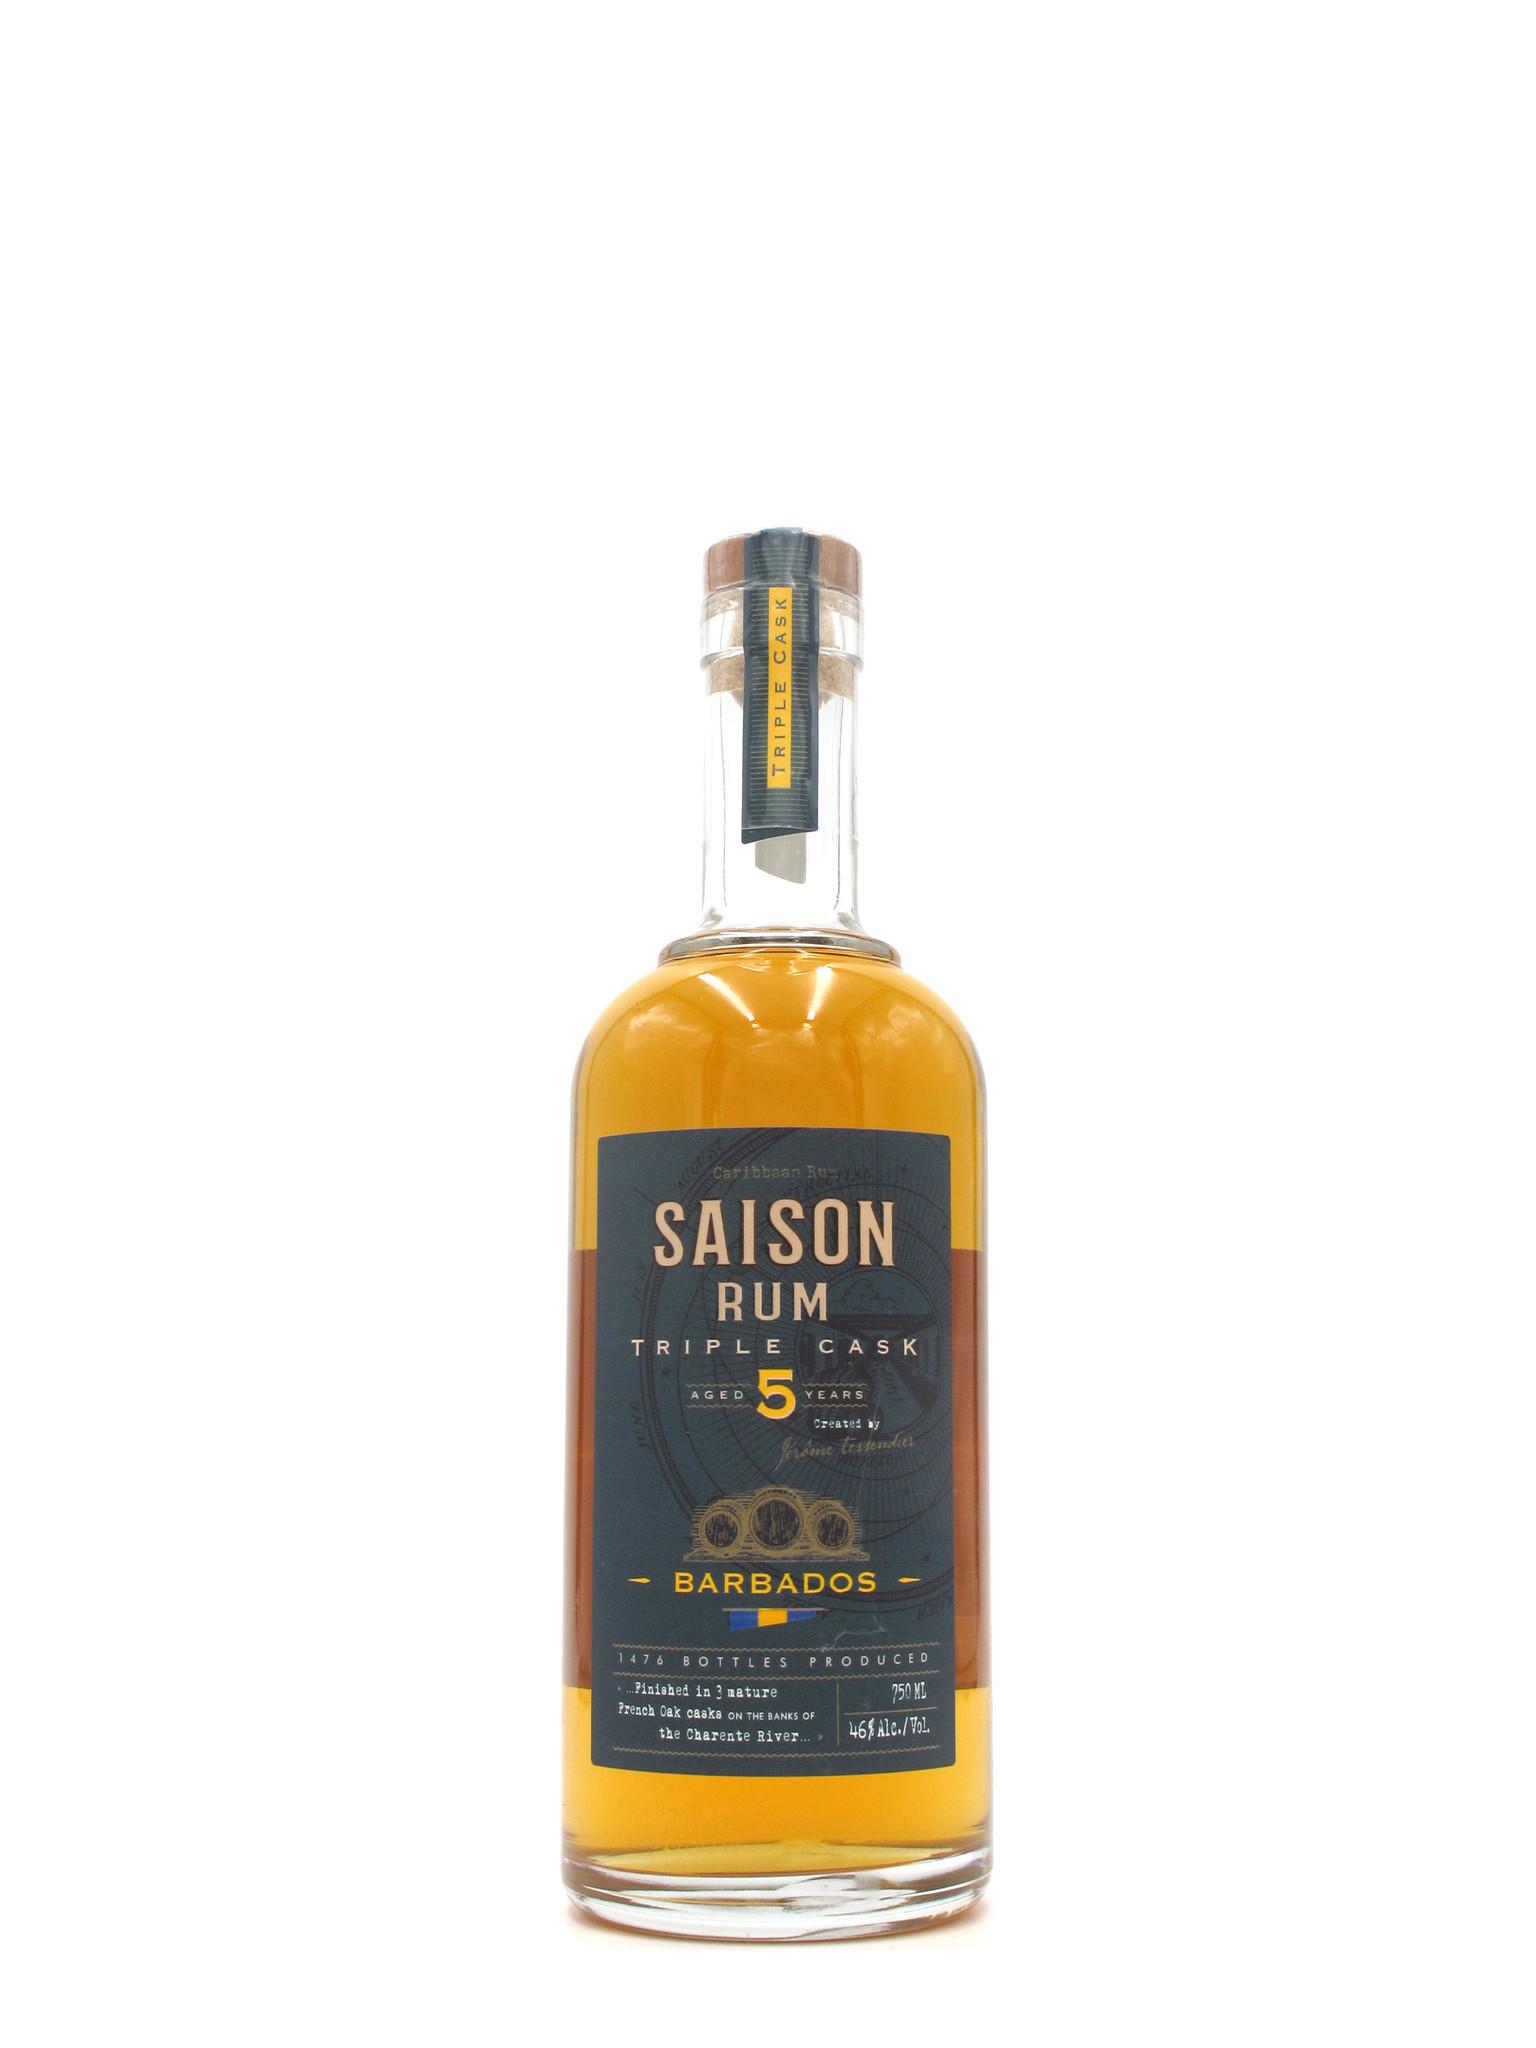 Saison Rum Saison Rum Triple Cask 5yr Barbados 750ml